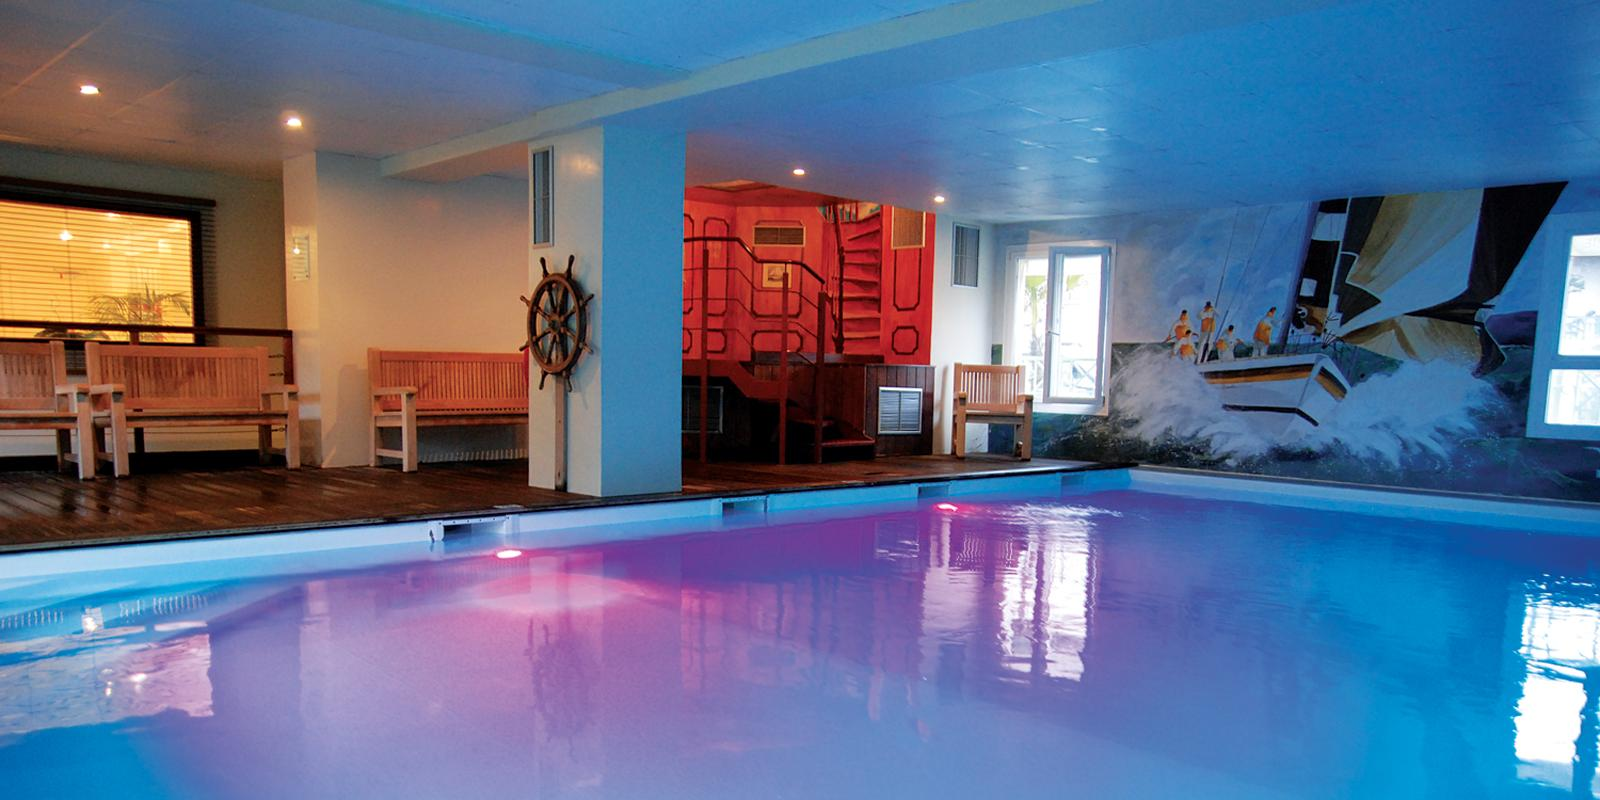 Hotel a honfleur - Hotel etretat piscine interieure ...